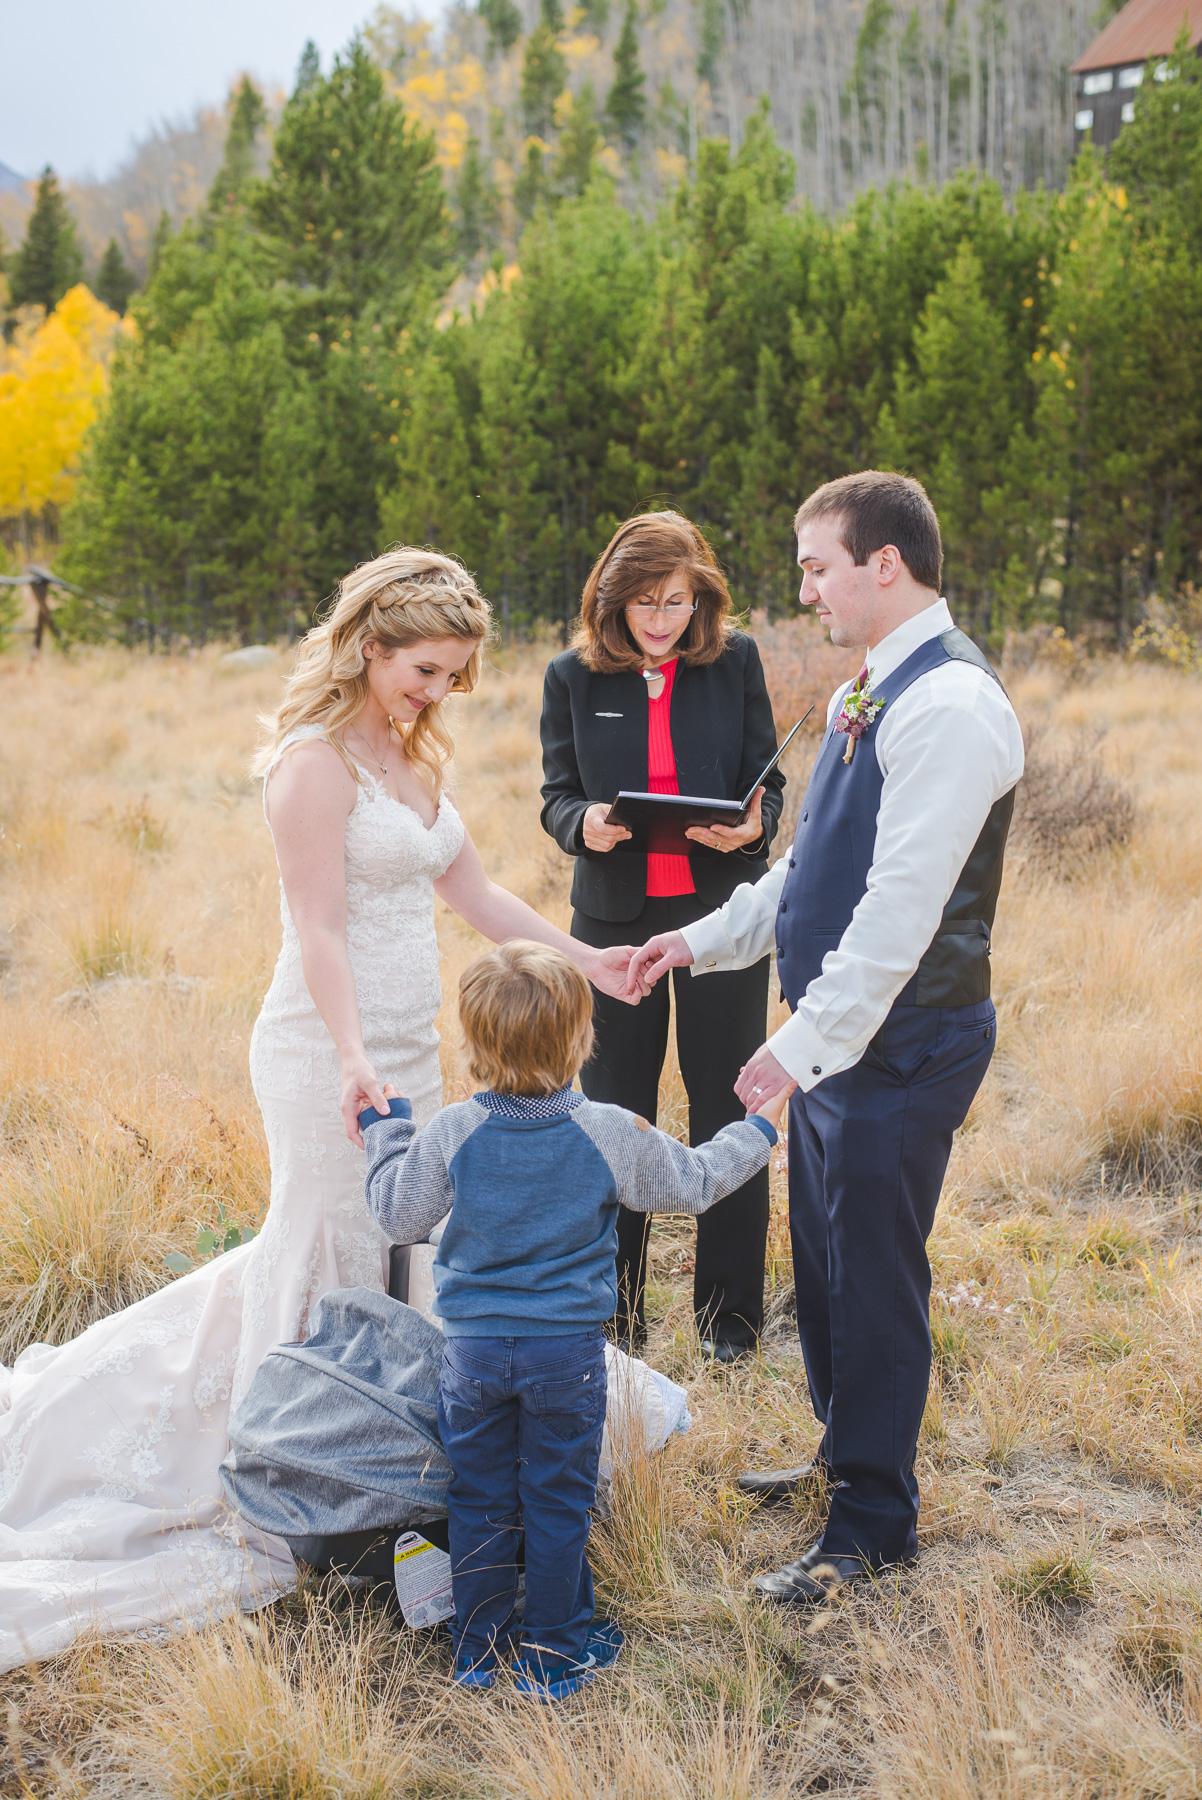 Autumn elopement in Breckenridge, Colorado | Family ceremony | Summit Mountain Weddings